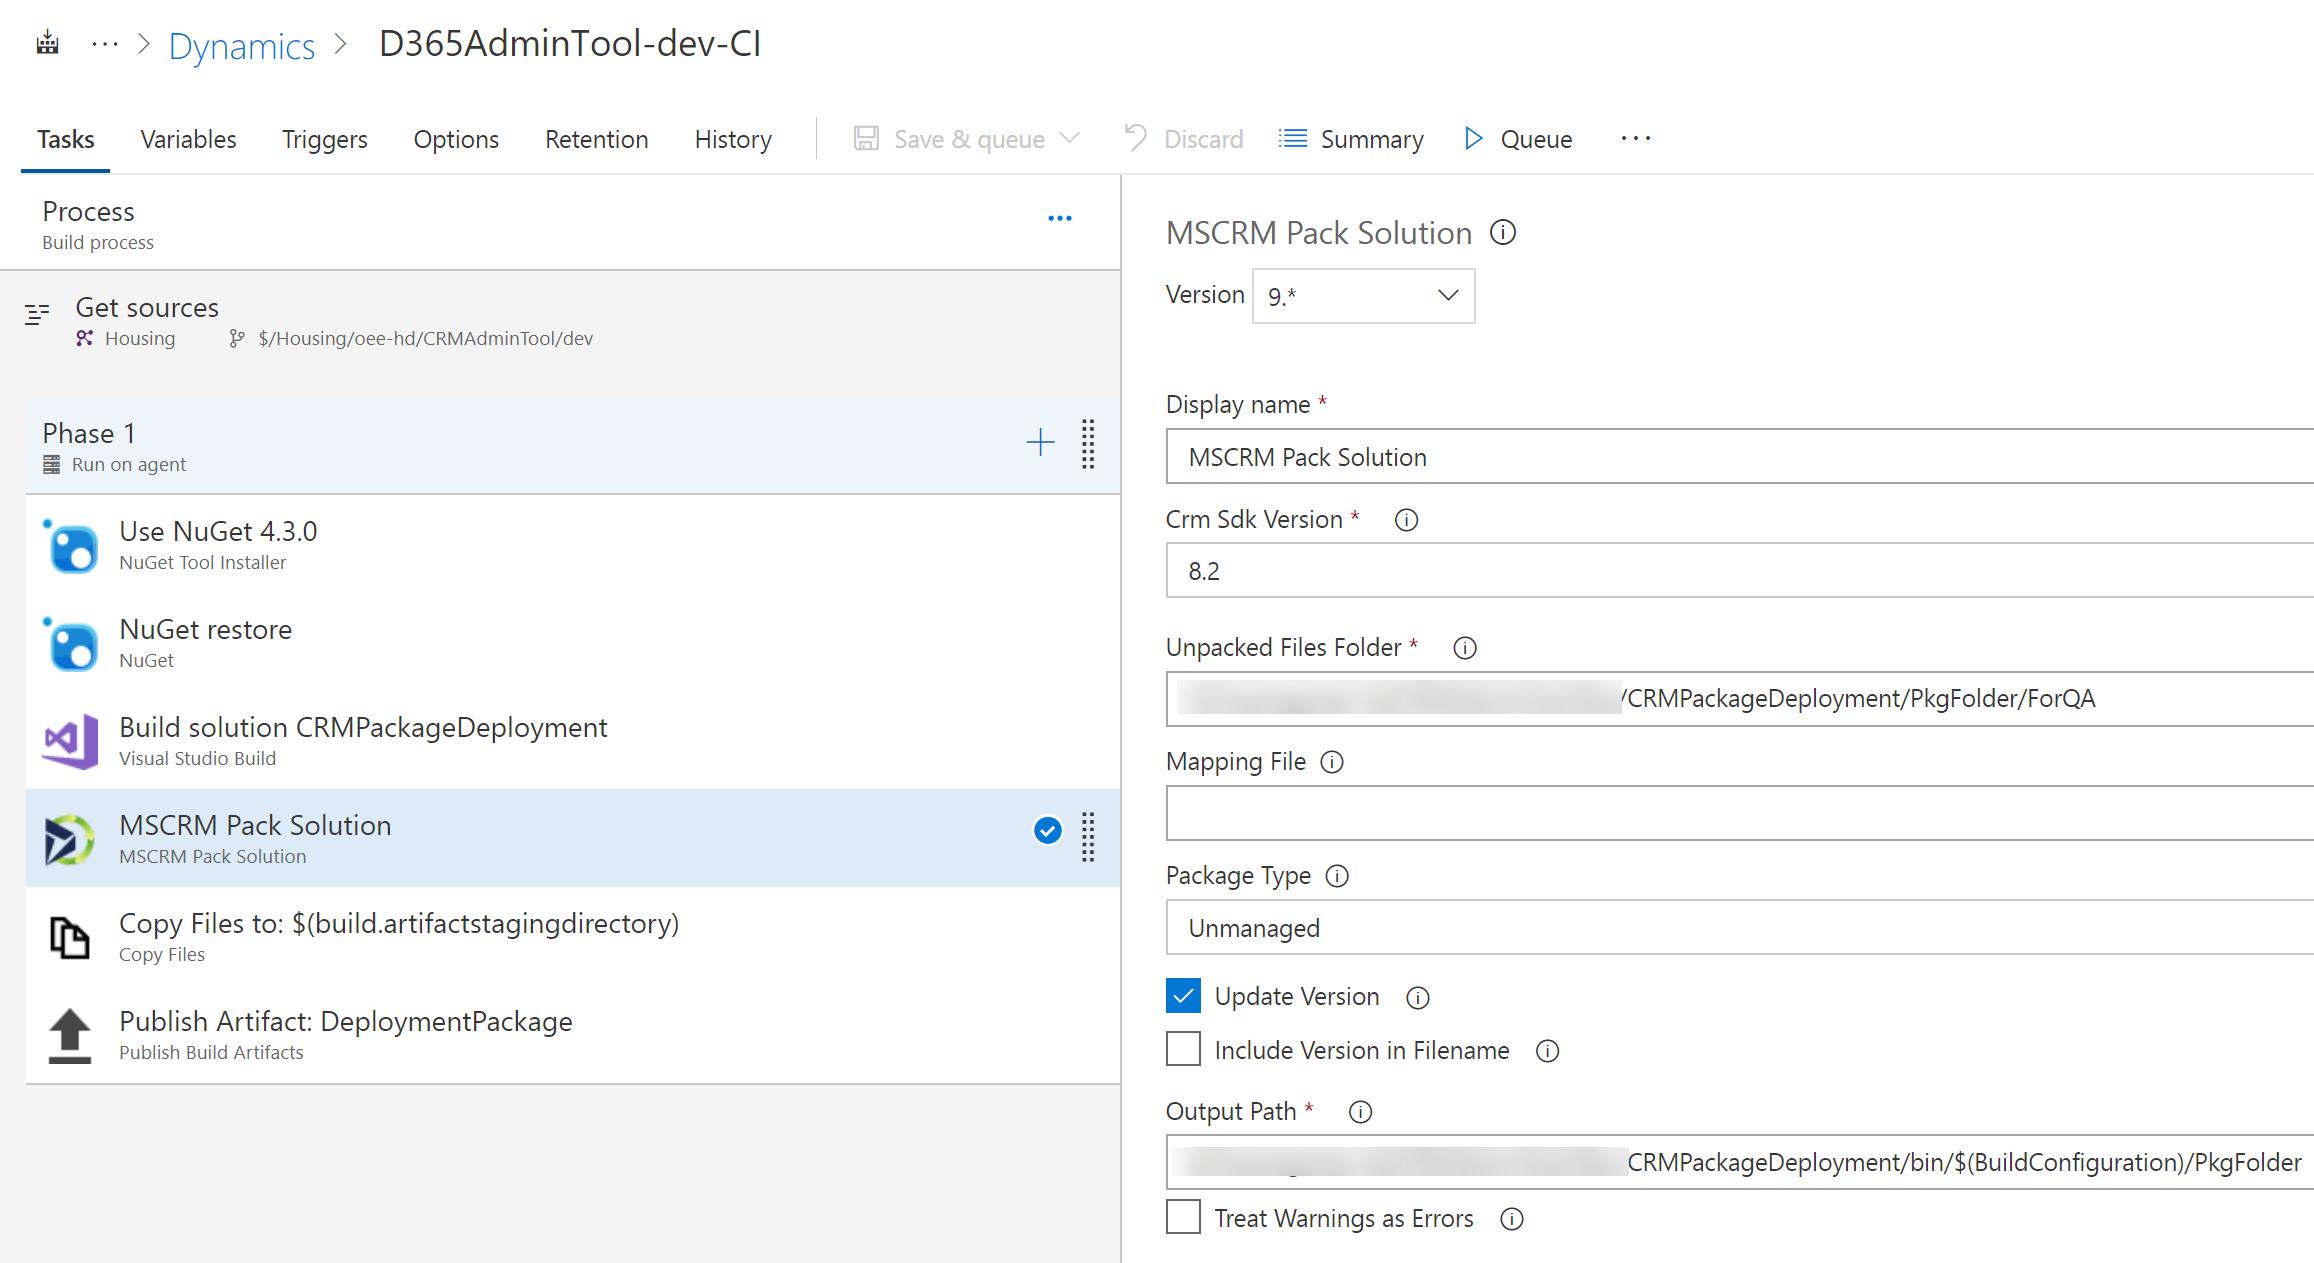 DevOps with Dynamics 365 using VSTS | Azure DevOps and